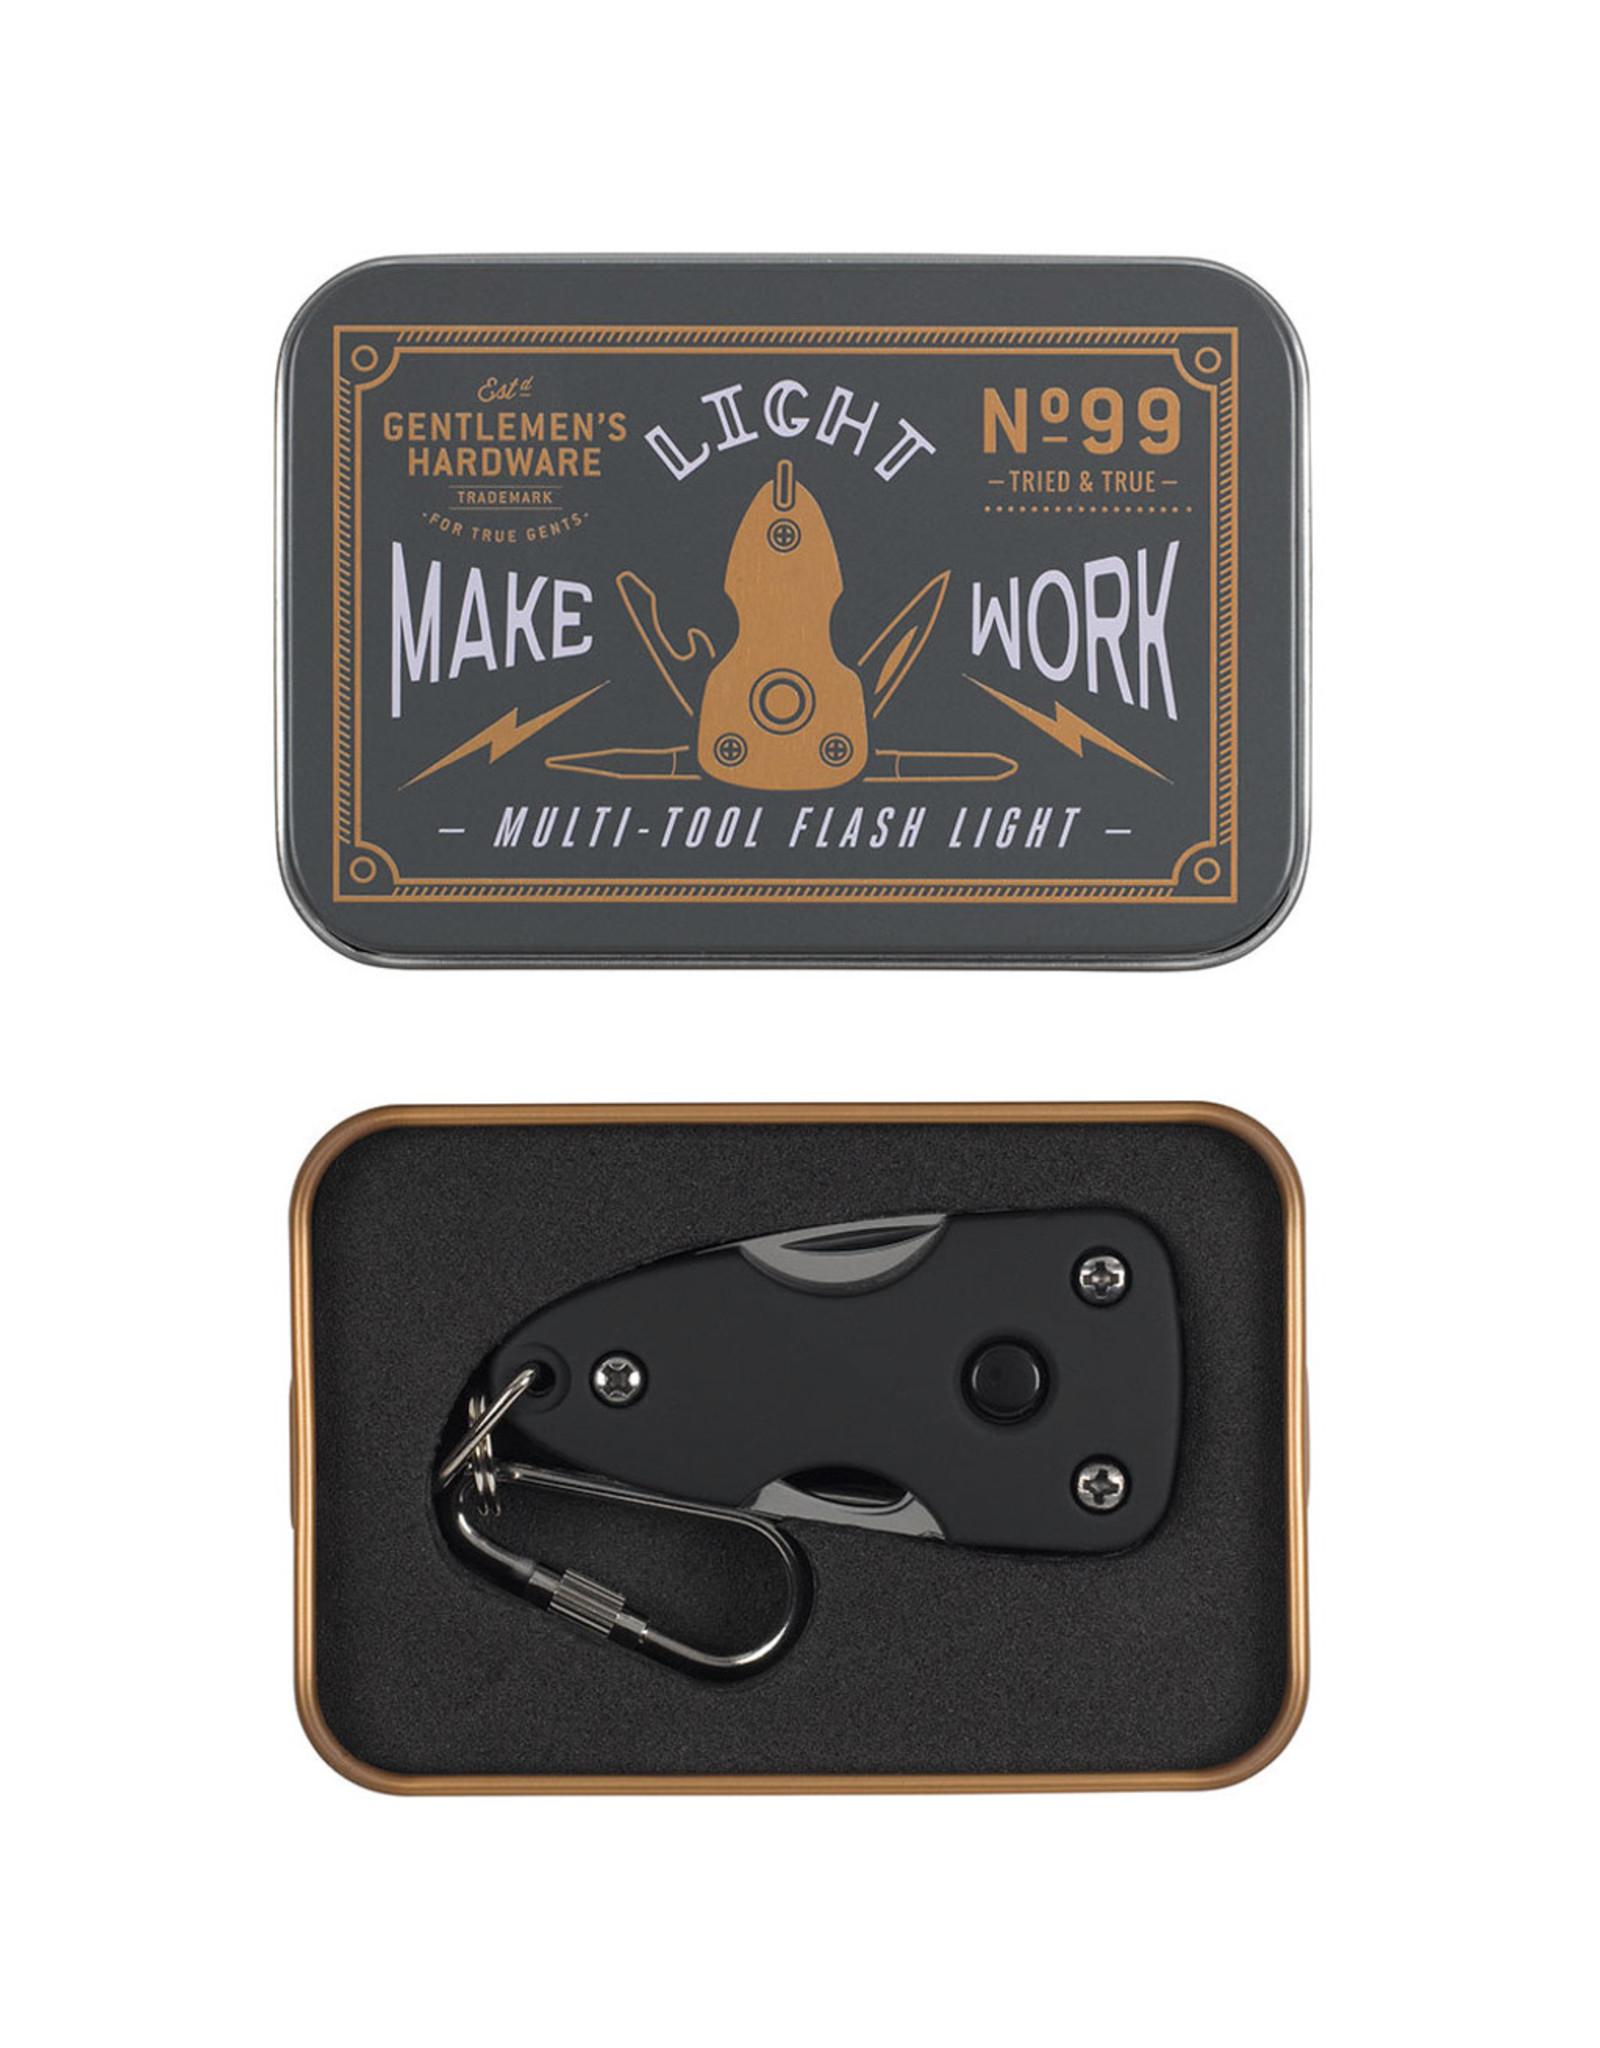 Gentlemen's Hardware Pocket Multi-Tool with Flashlight